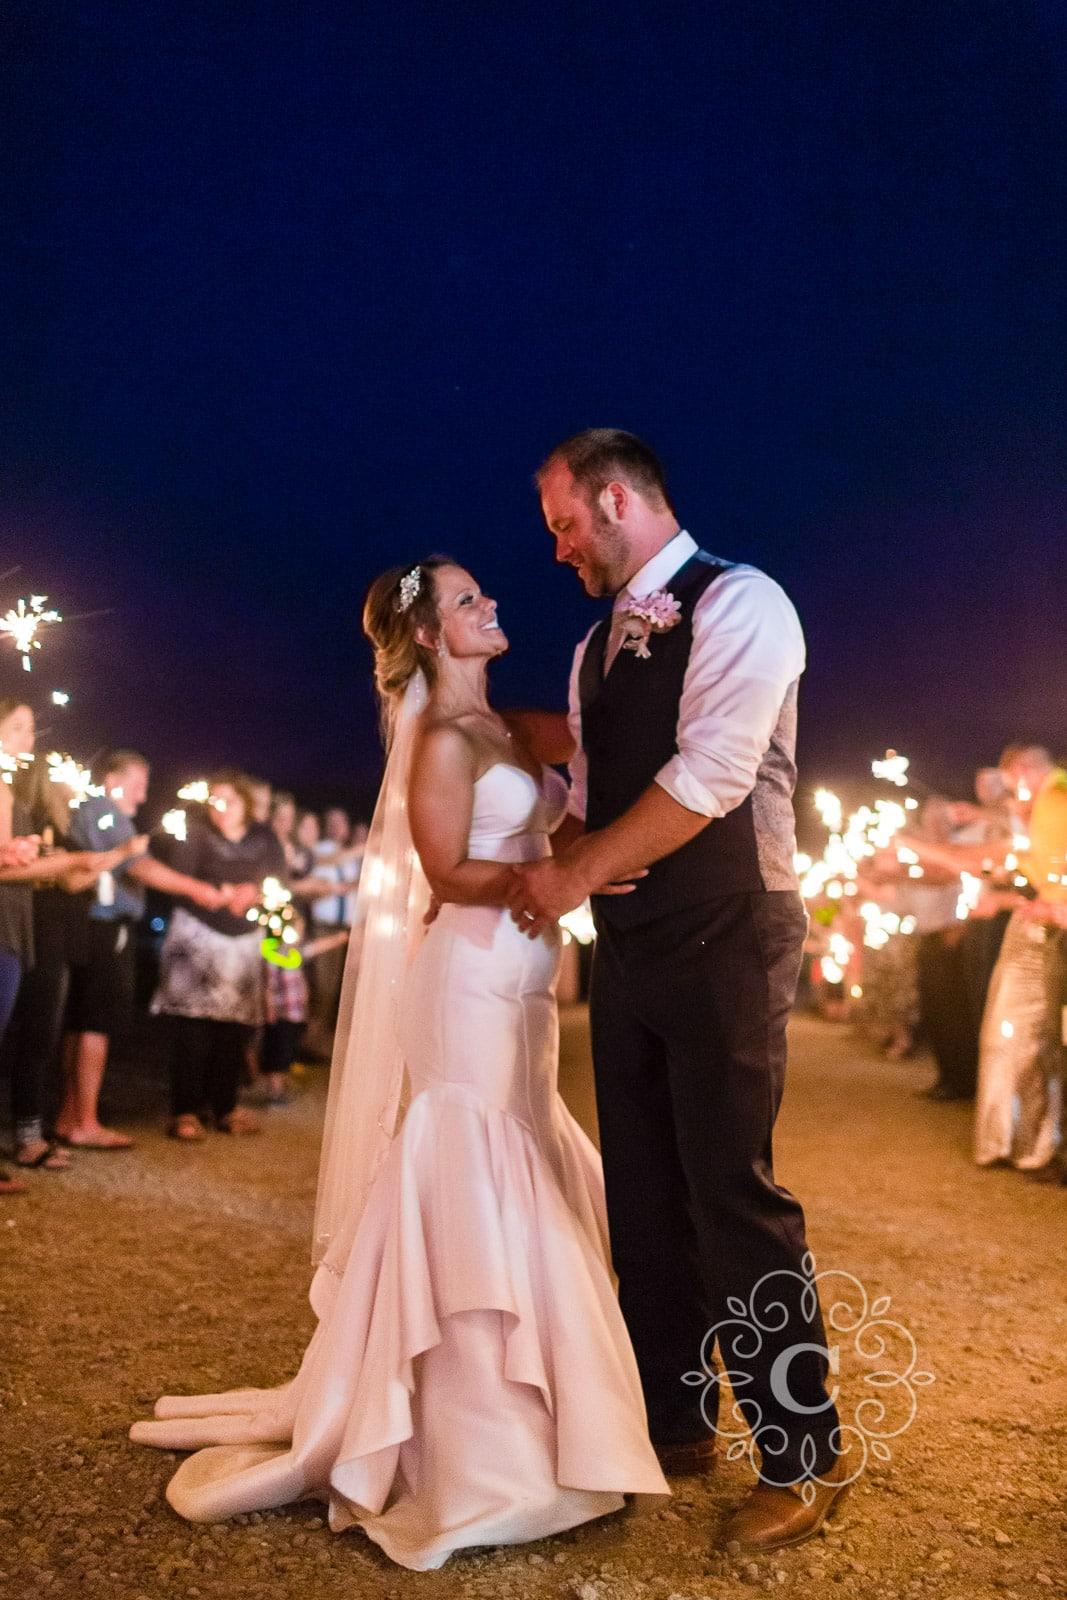 Minnesota Barn Sparkler Wedding Photos